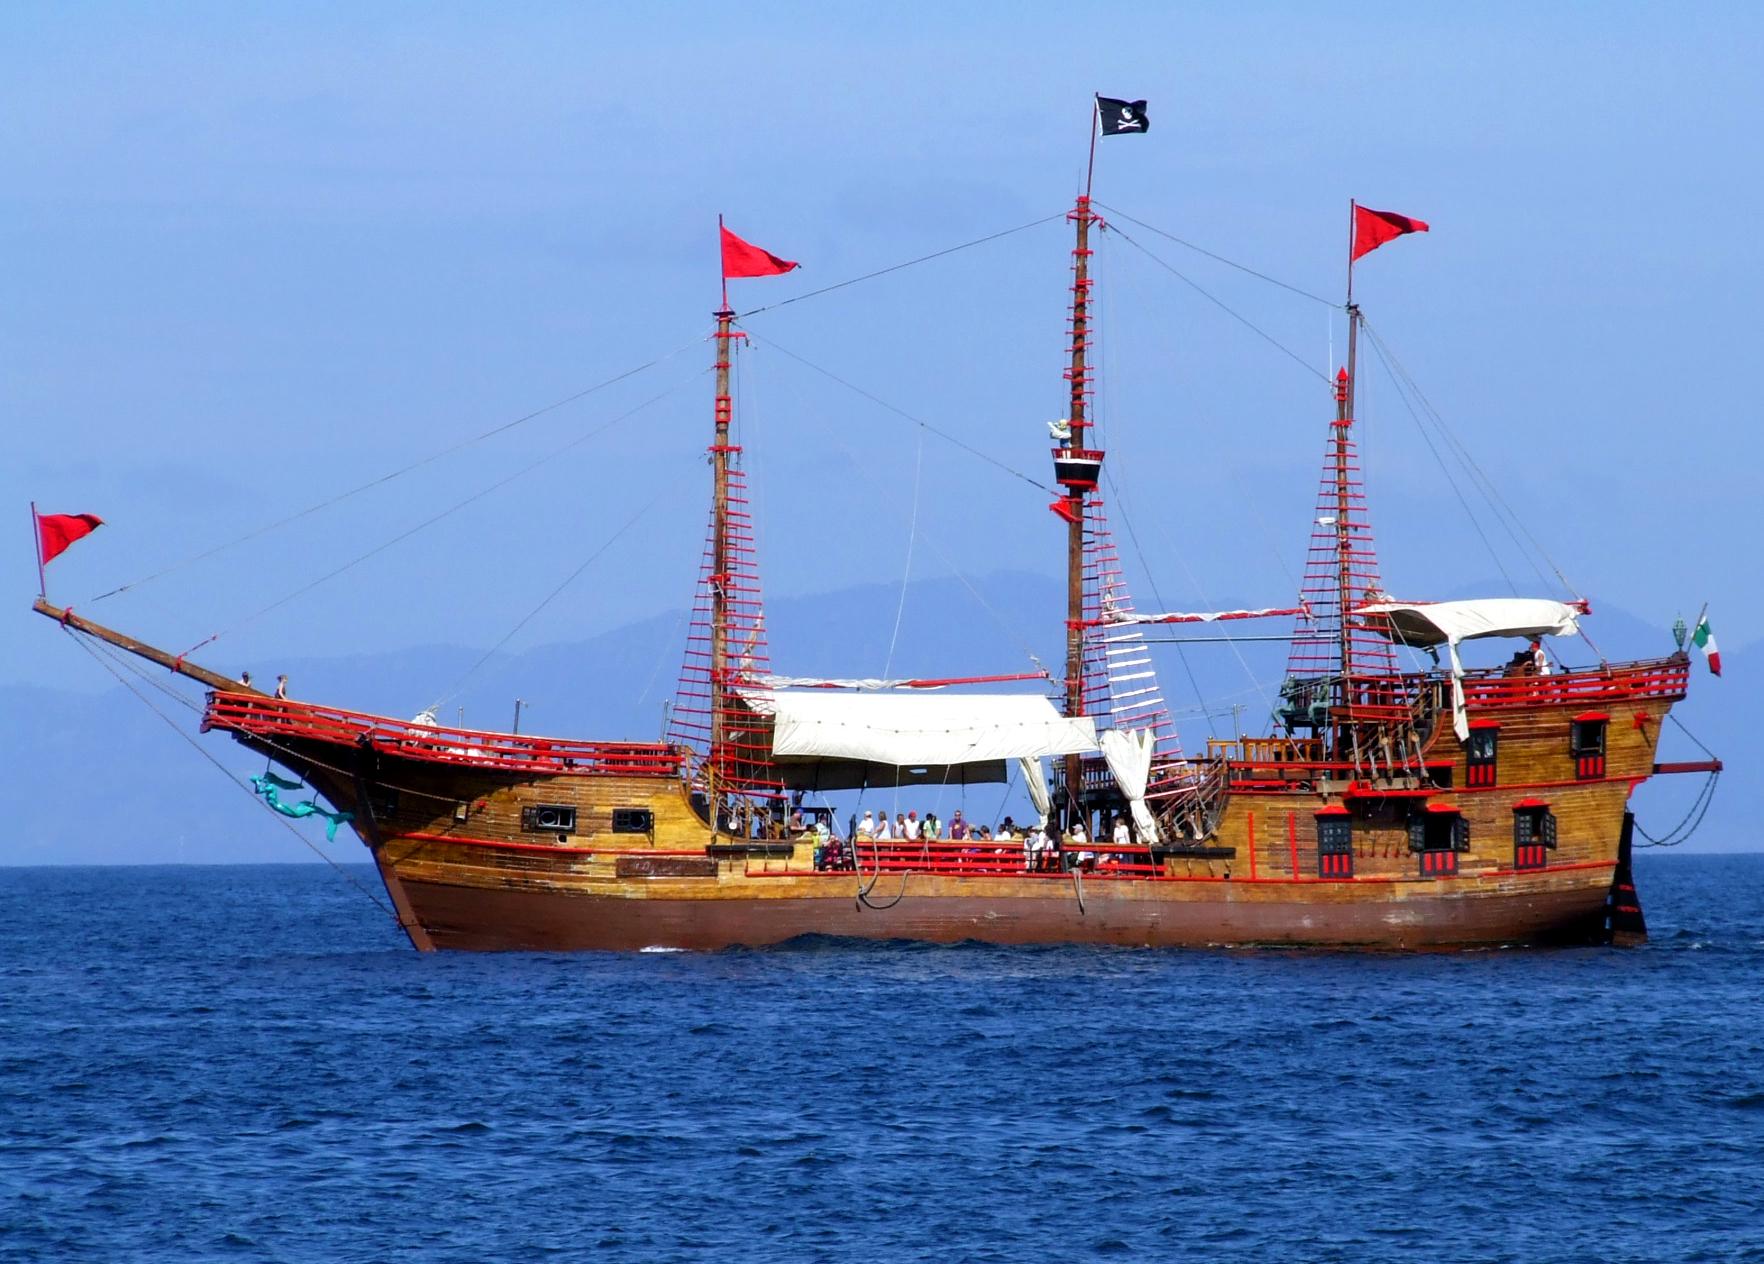 Puerto Vallarta – Marigalante Pirate Ship History